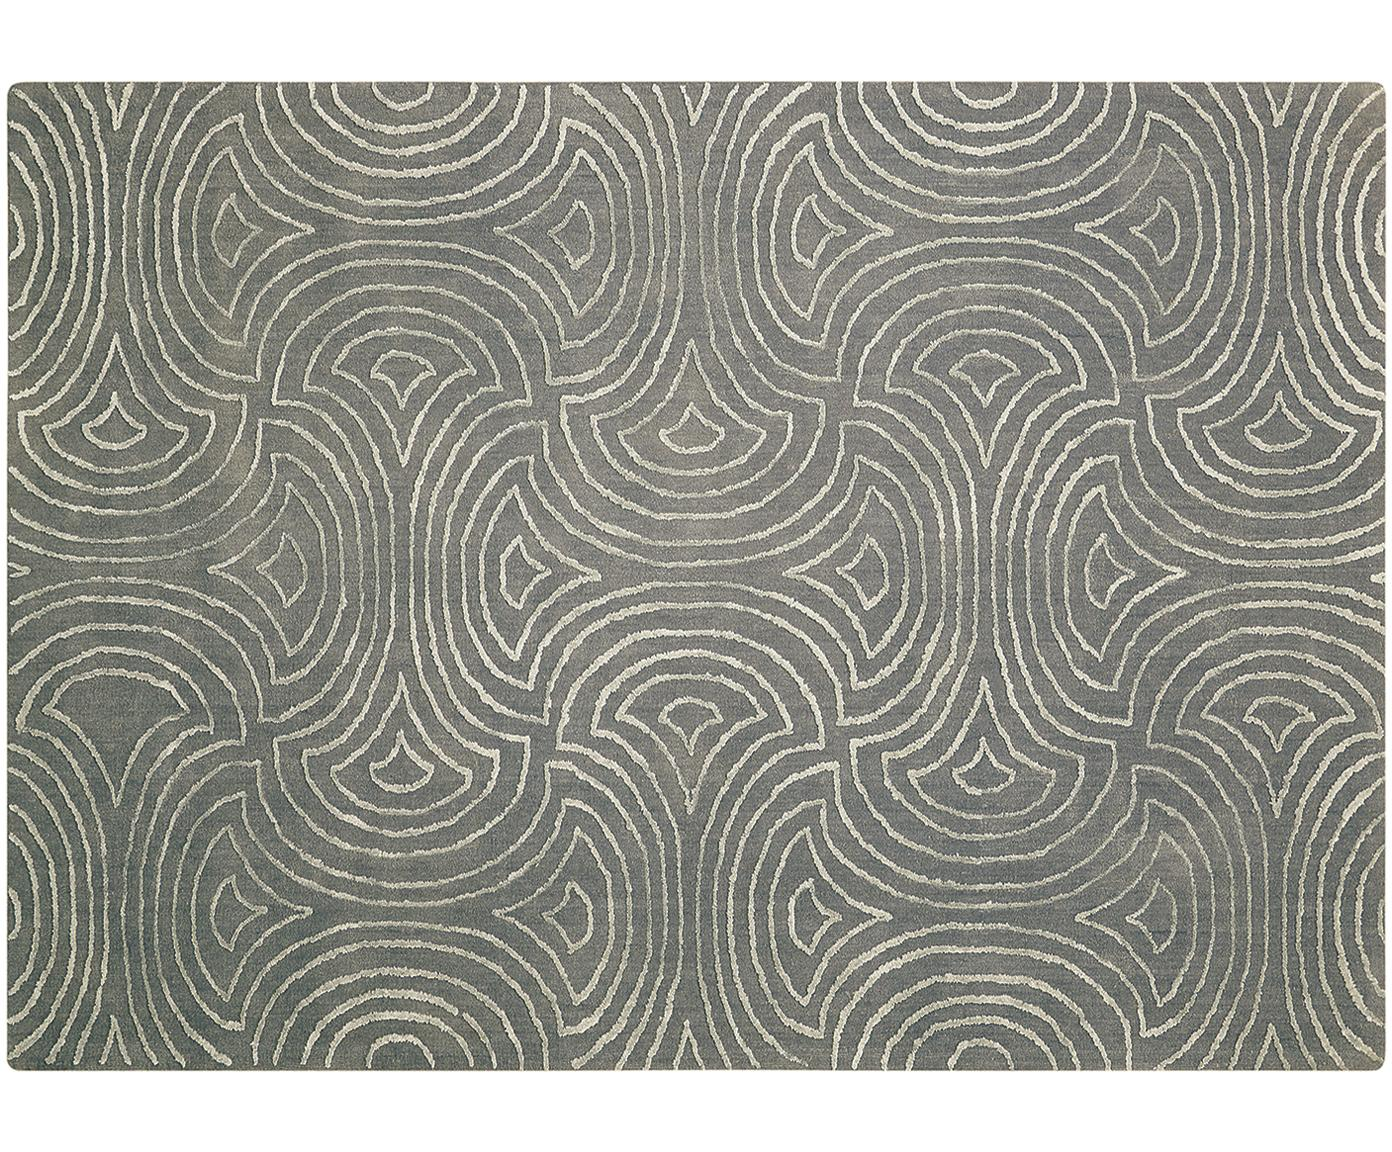 Alfombra artesanal Vita Illusion, Parte superior: 90%poliéster, 10%viscos, Reverso: algodón, revestido de lát, Verde musgo, An 150 x L 215 cm (Tamaño M)